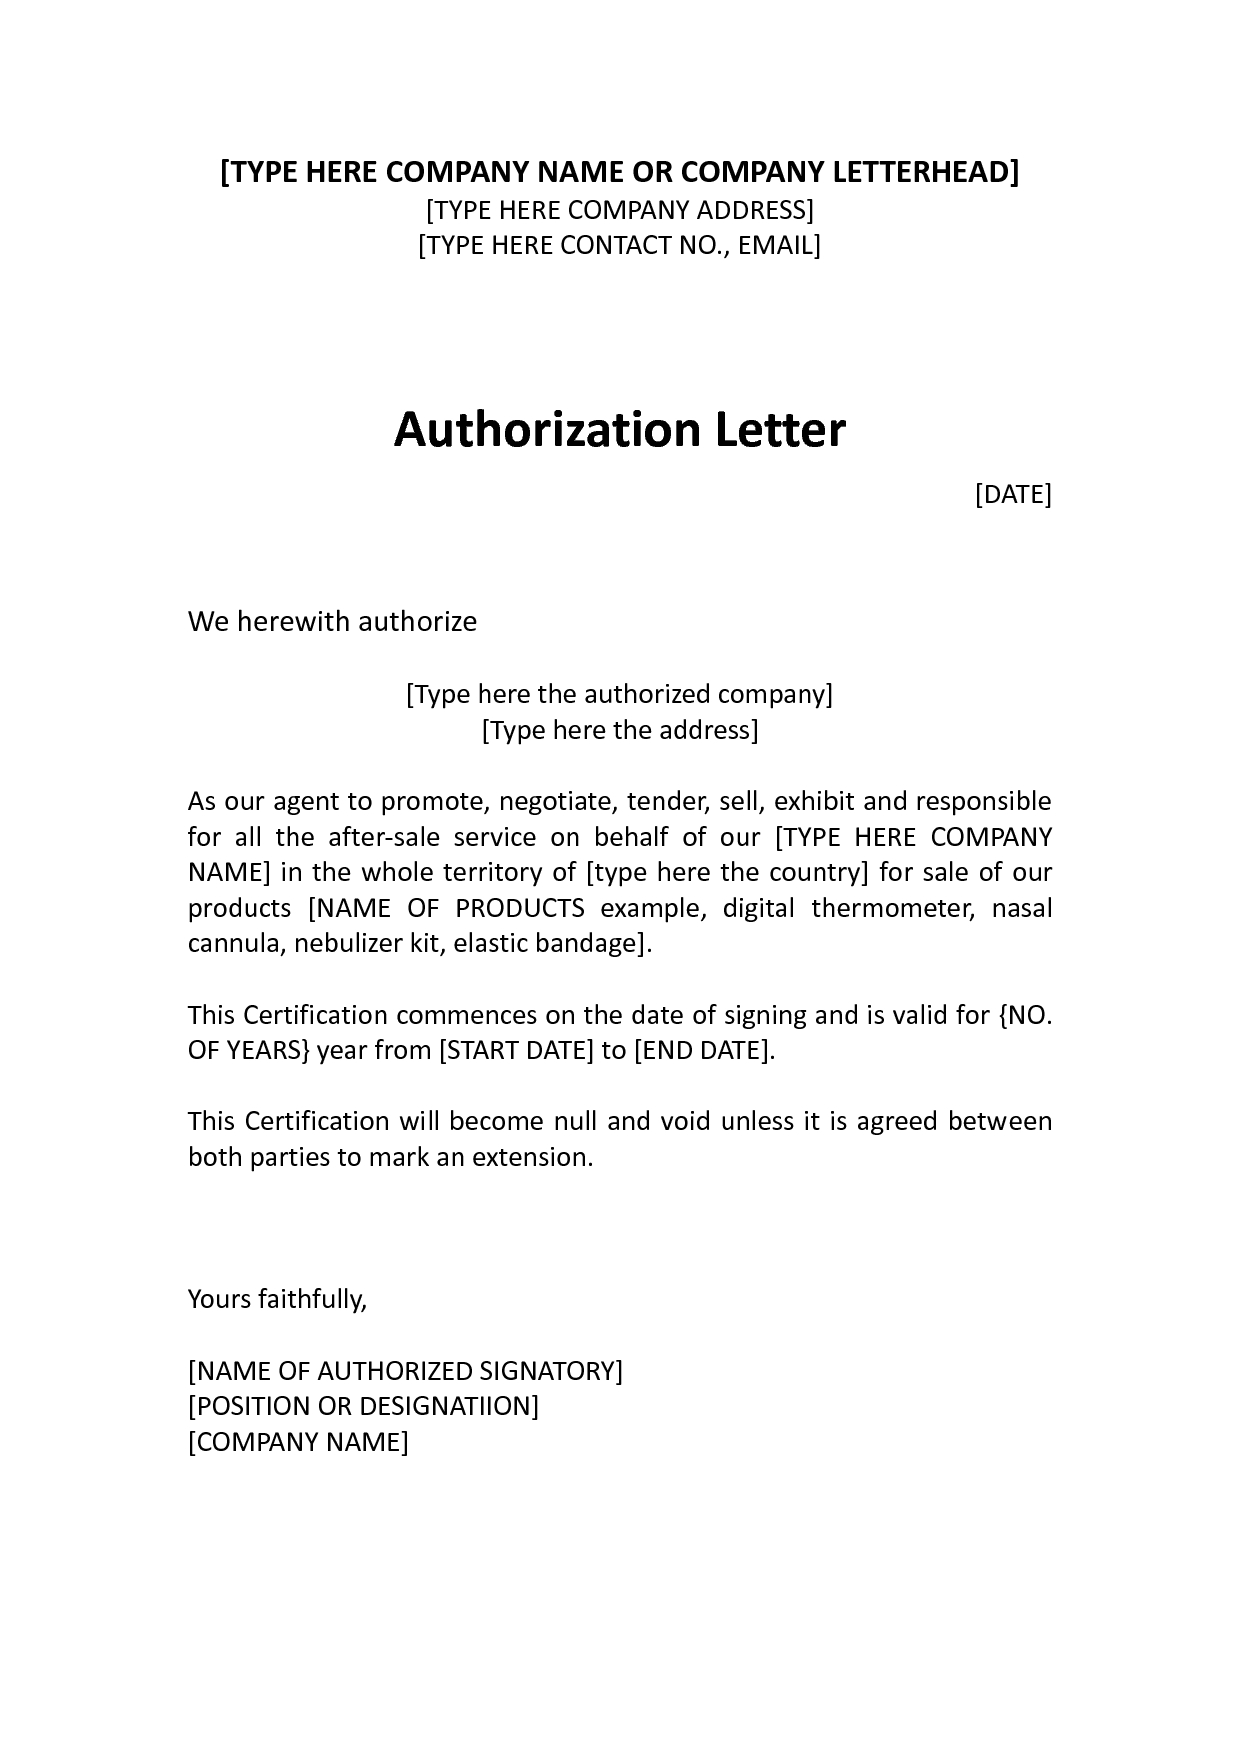 Real Estate Commission Letter Template - Authorization Distributor Letter Sample Distributor Dealer